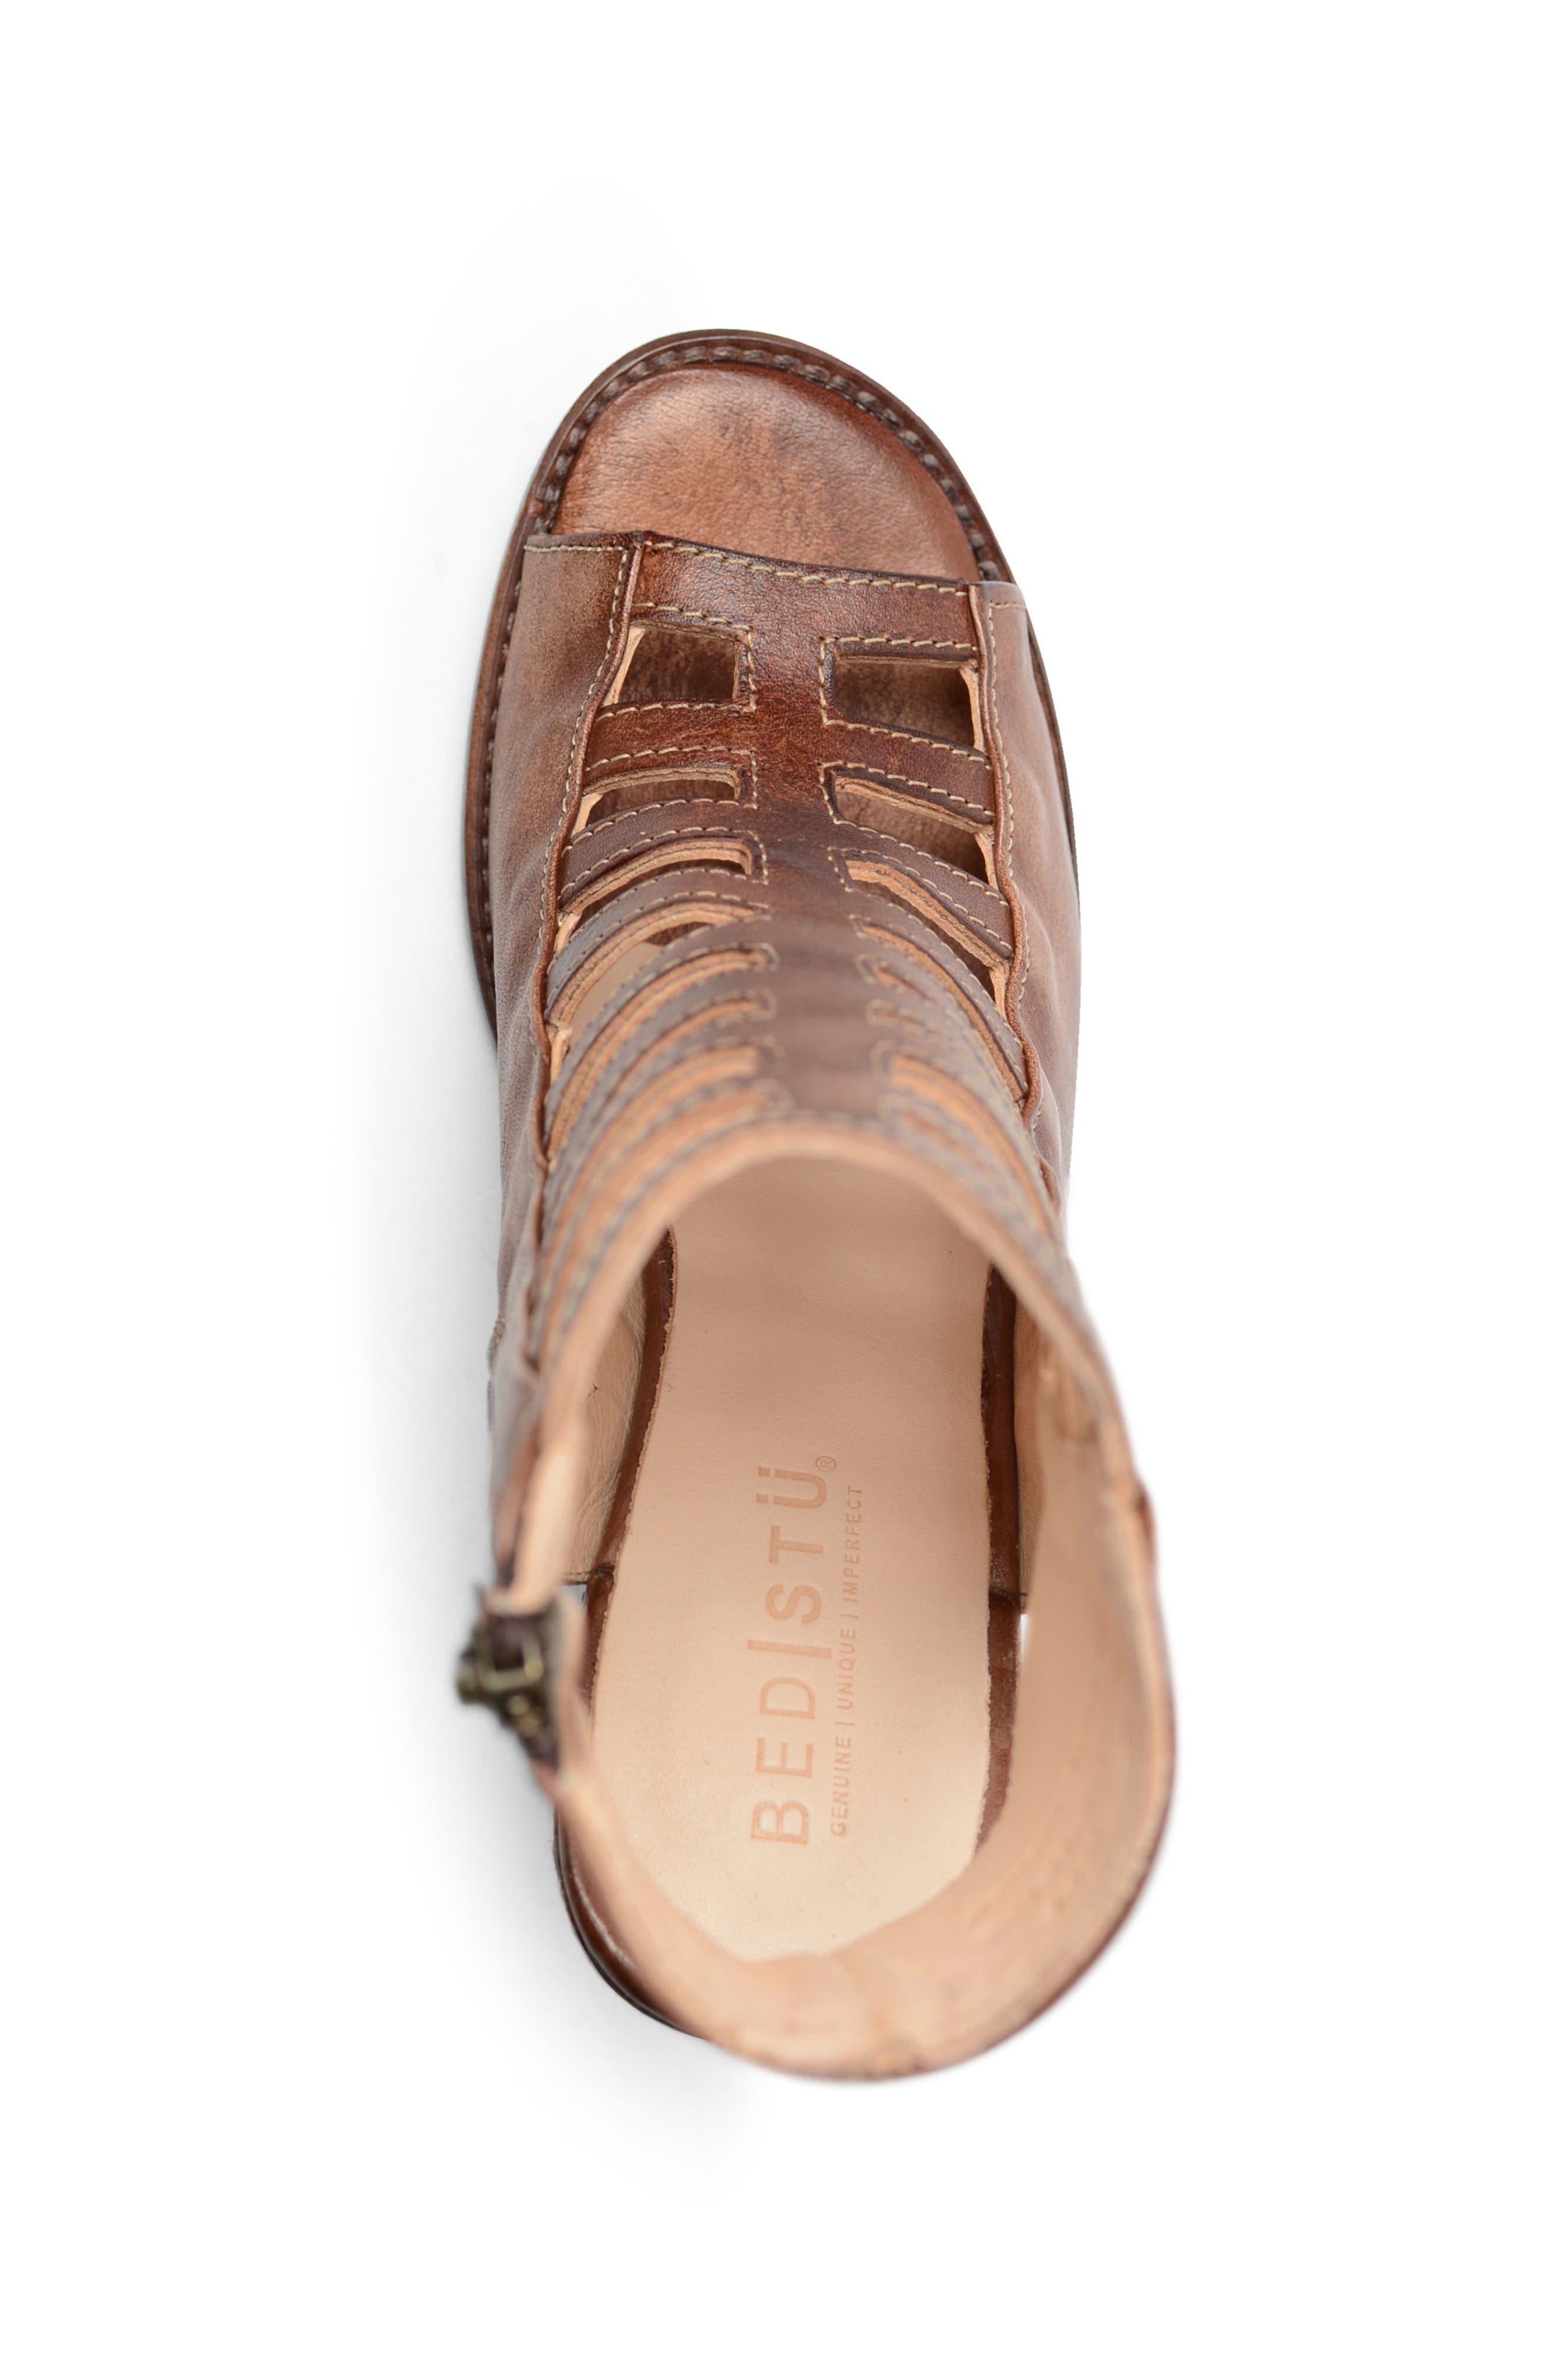 Occam Caged Sandal,                             Alternate thumbnail 3, color,                             Teak Rustic Leather